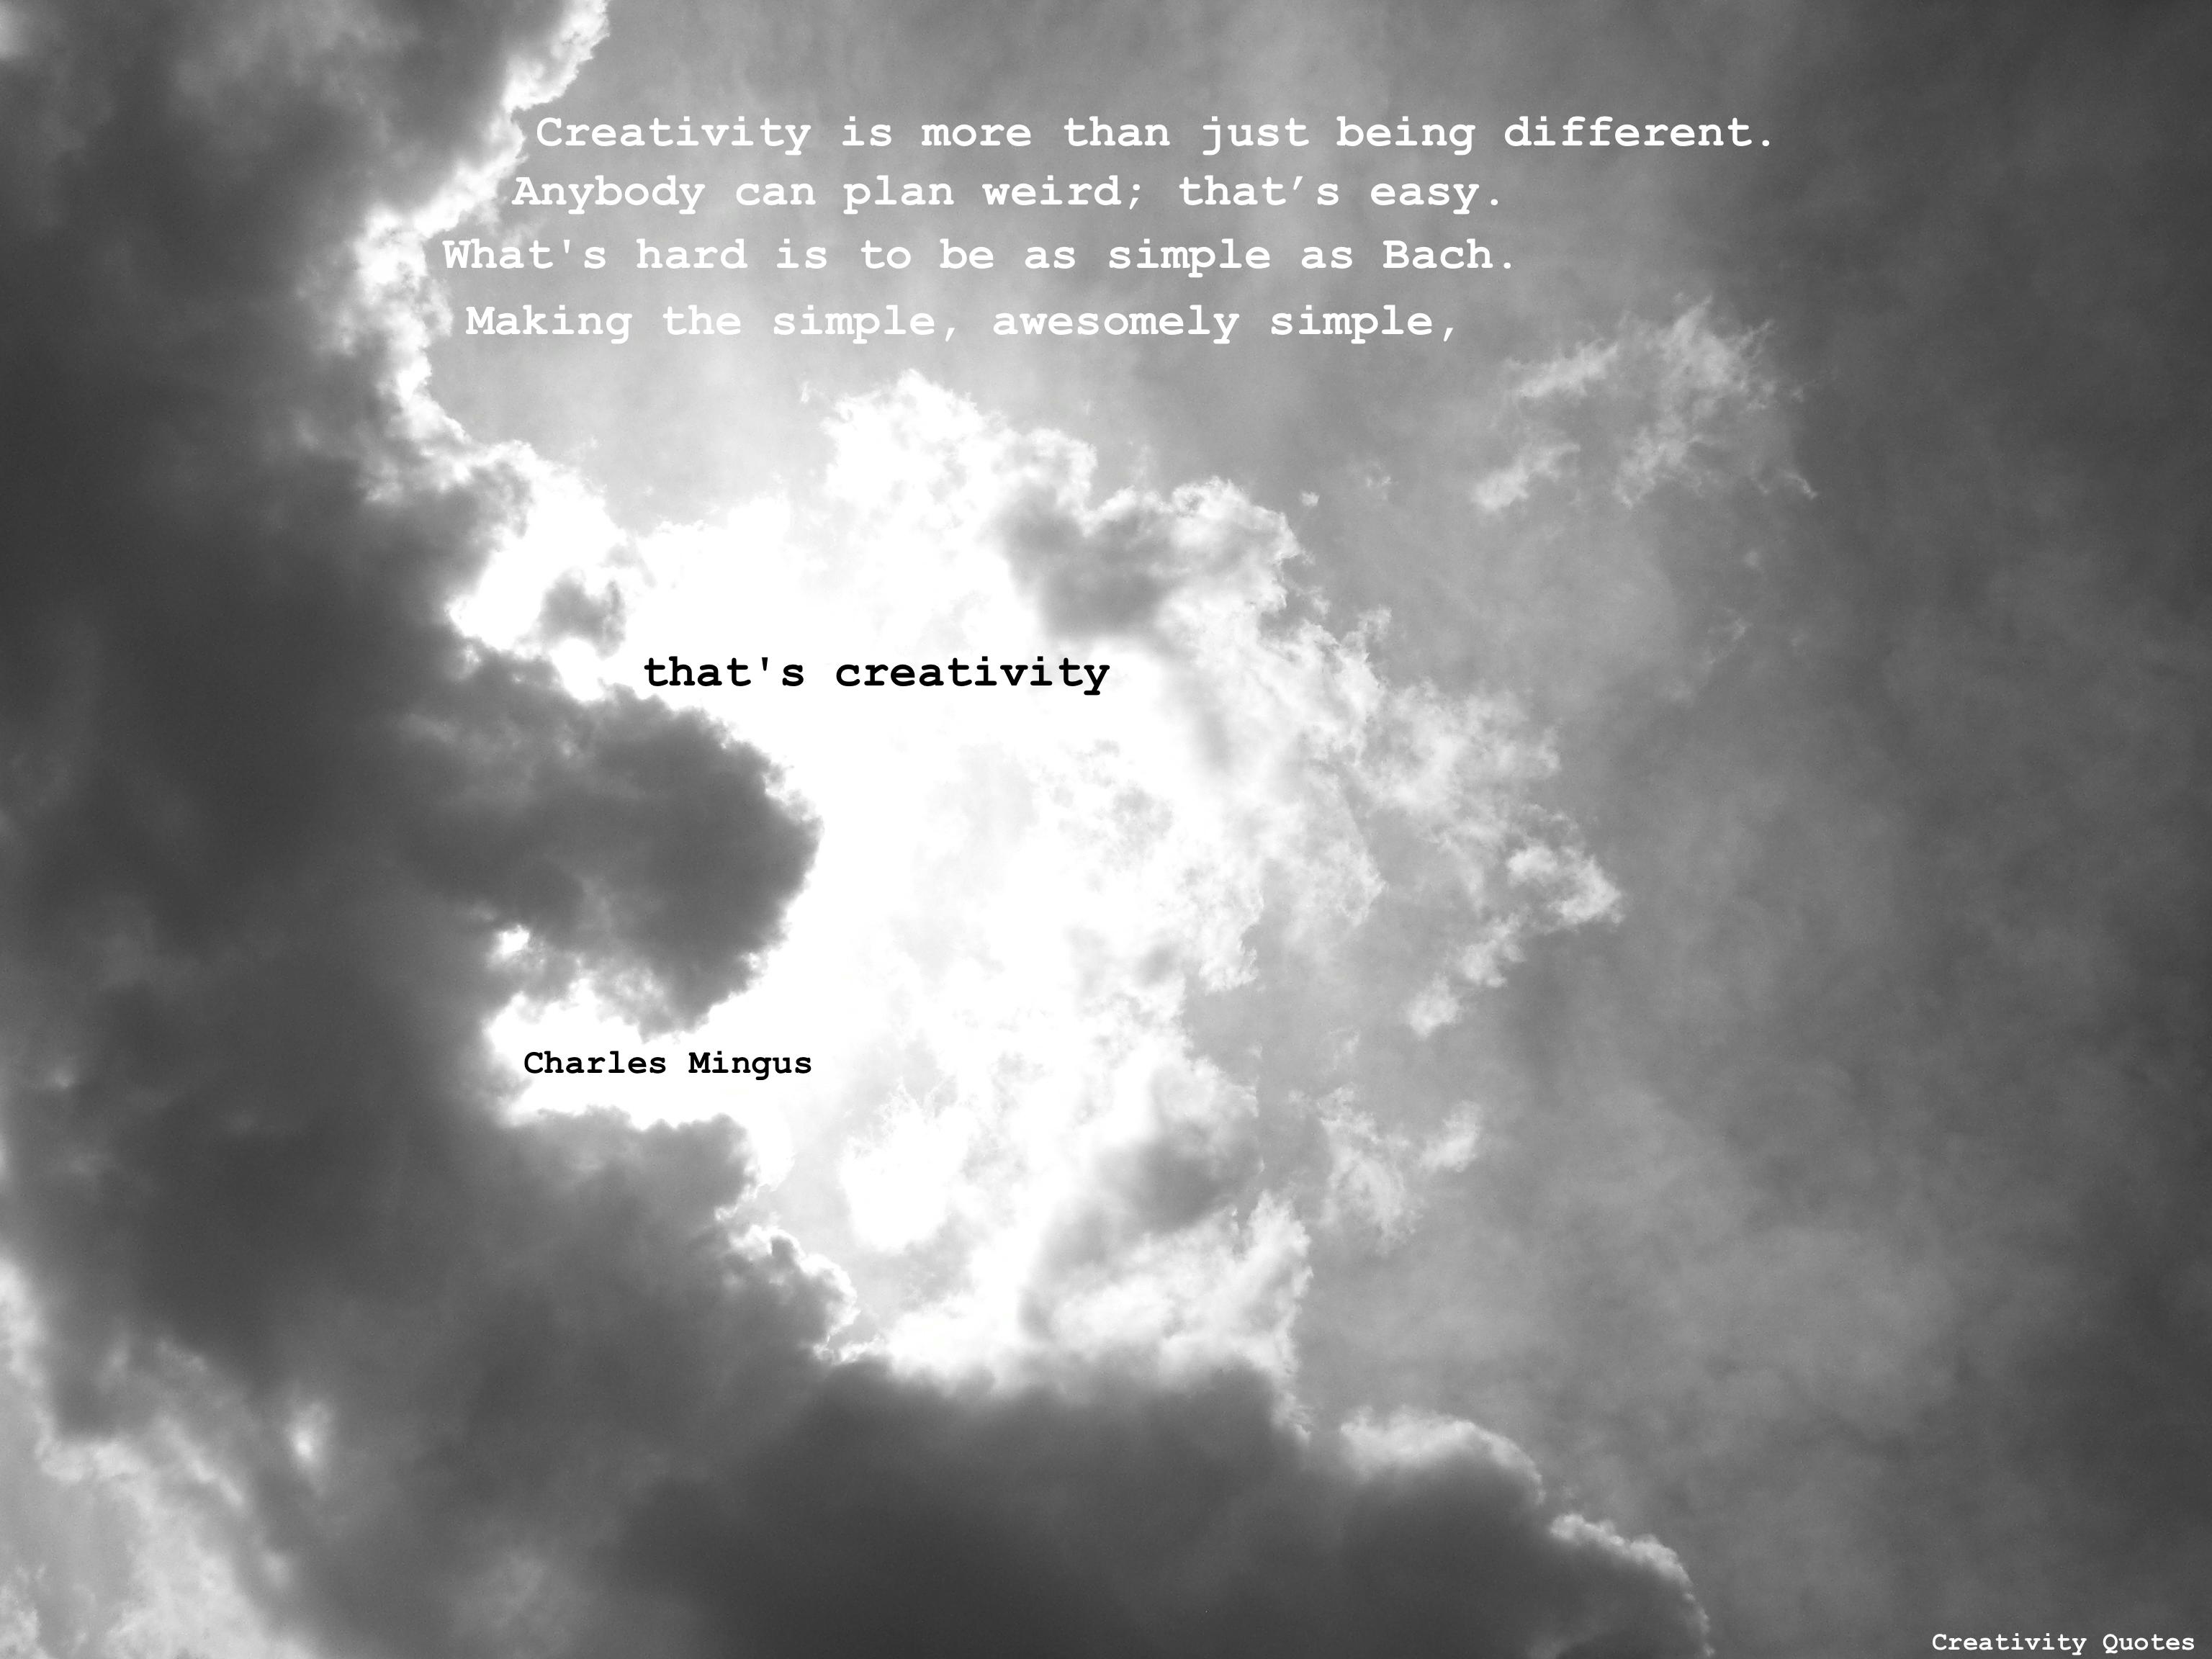 Charles Mingus's quote #1